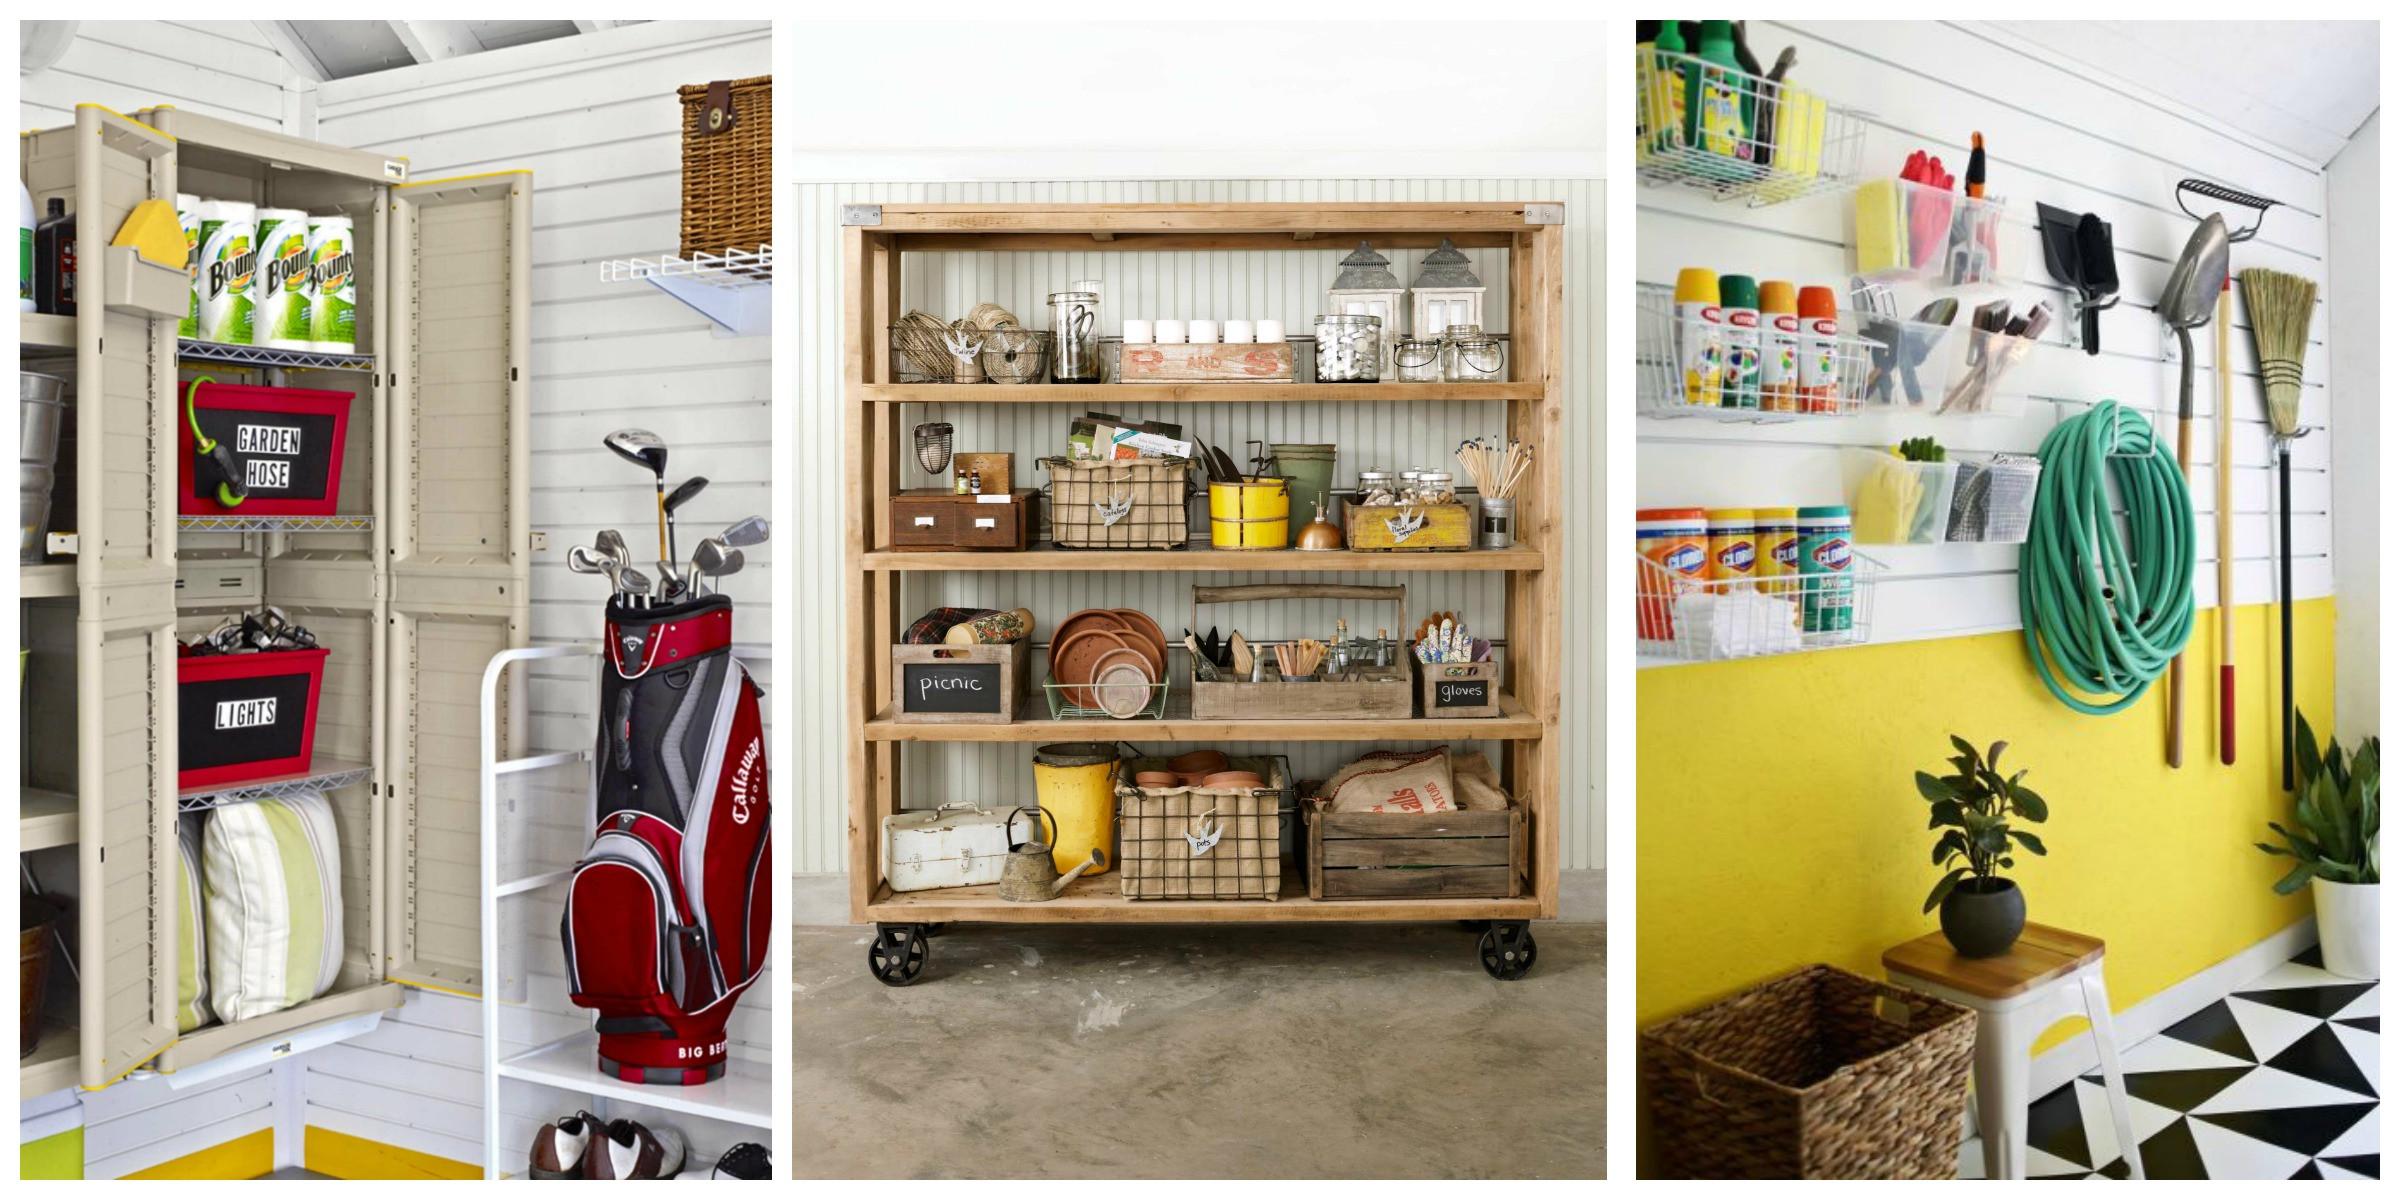 Best ideas about DIY Garage Ideas . Save or Pin 14 of the Best Garage Organization Ideas on Pinterest Now.